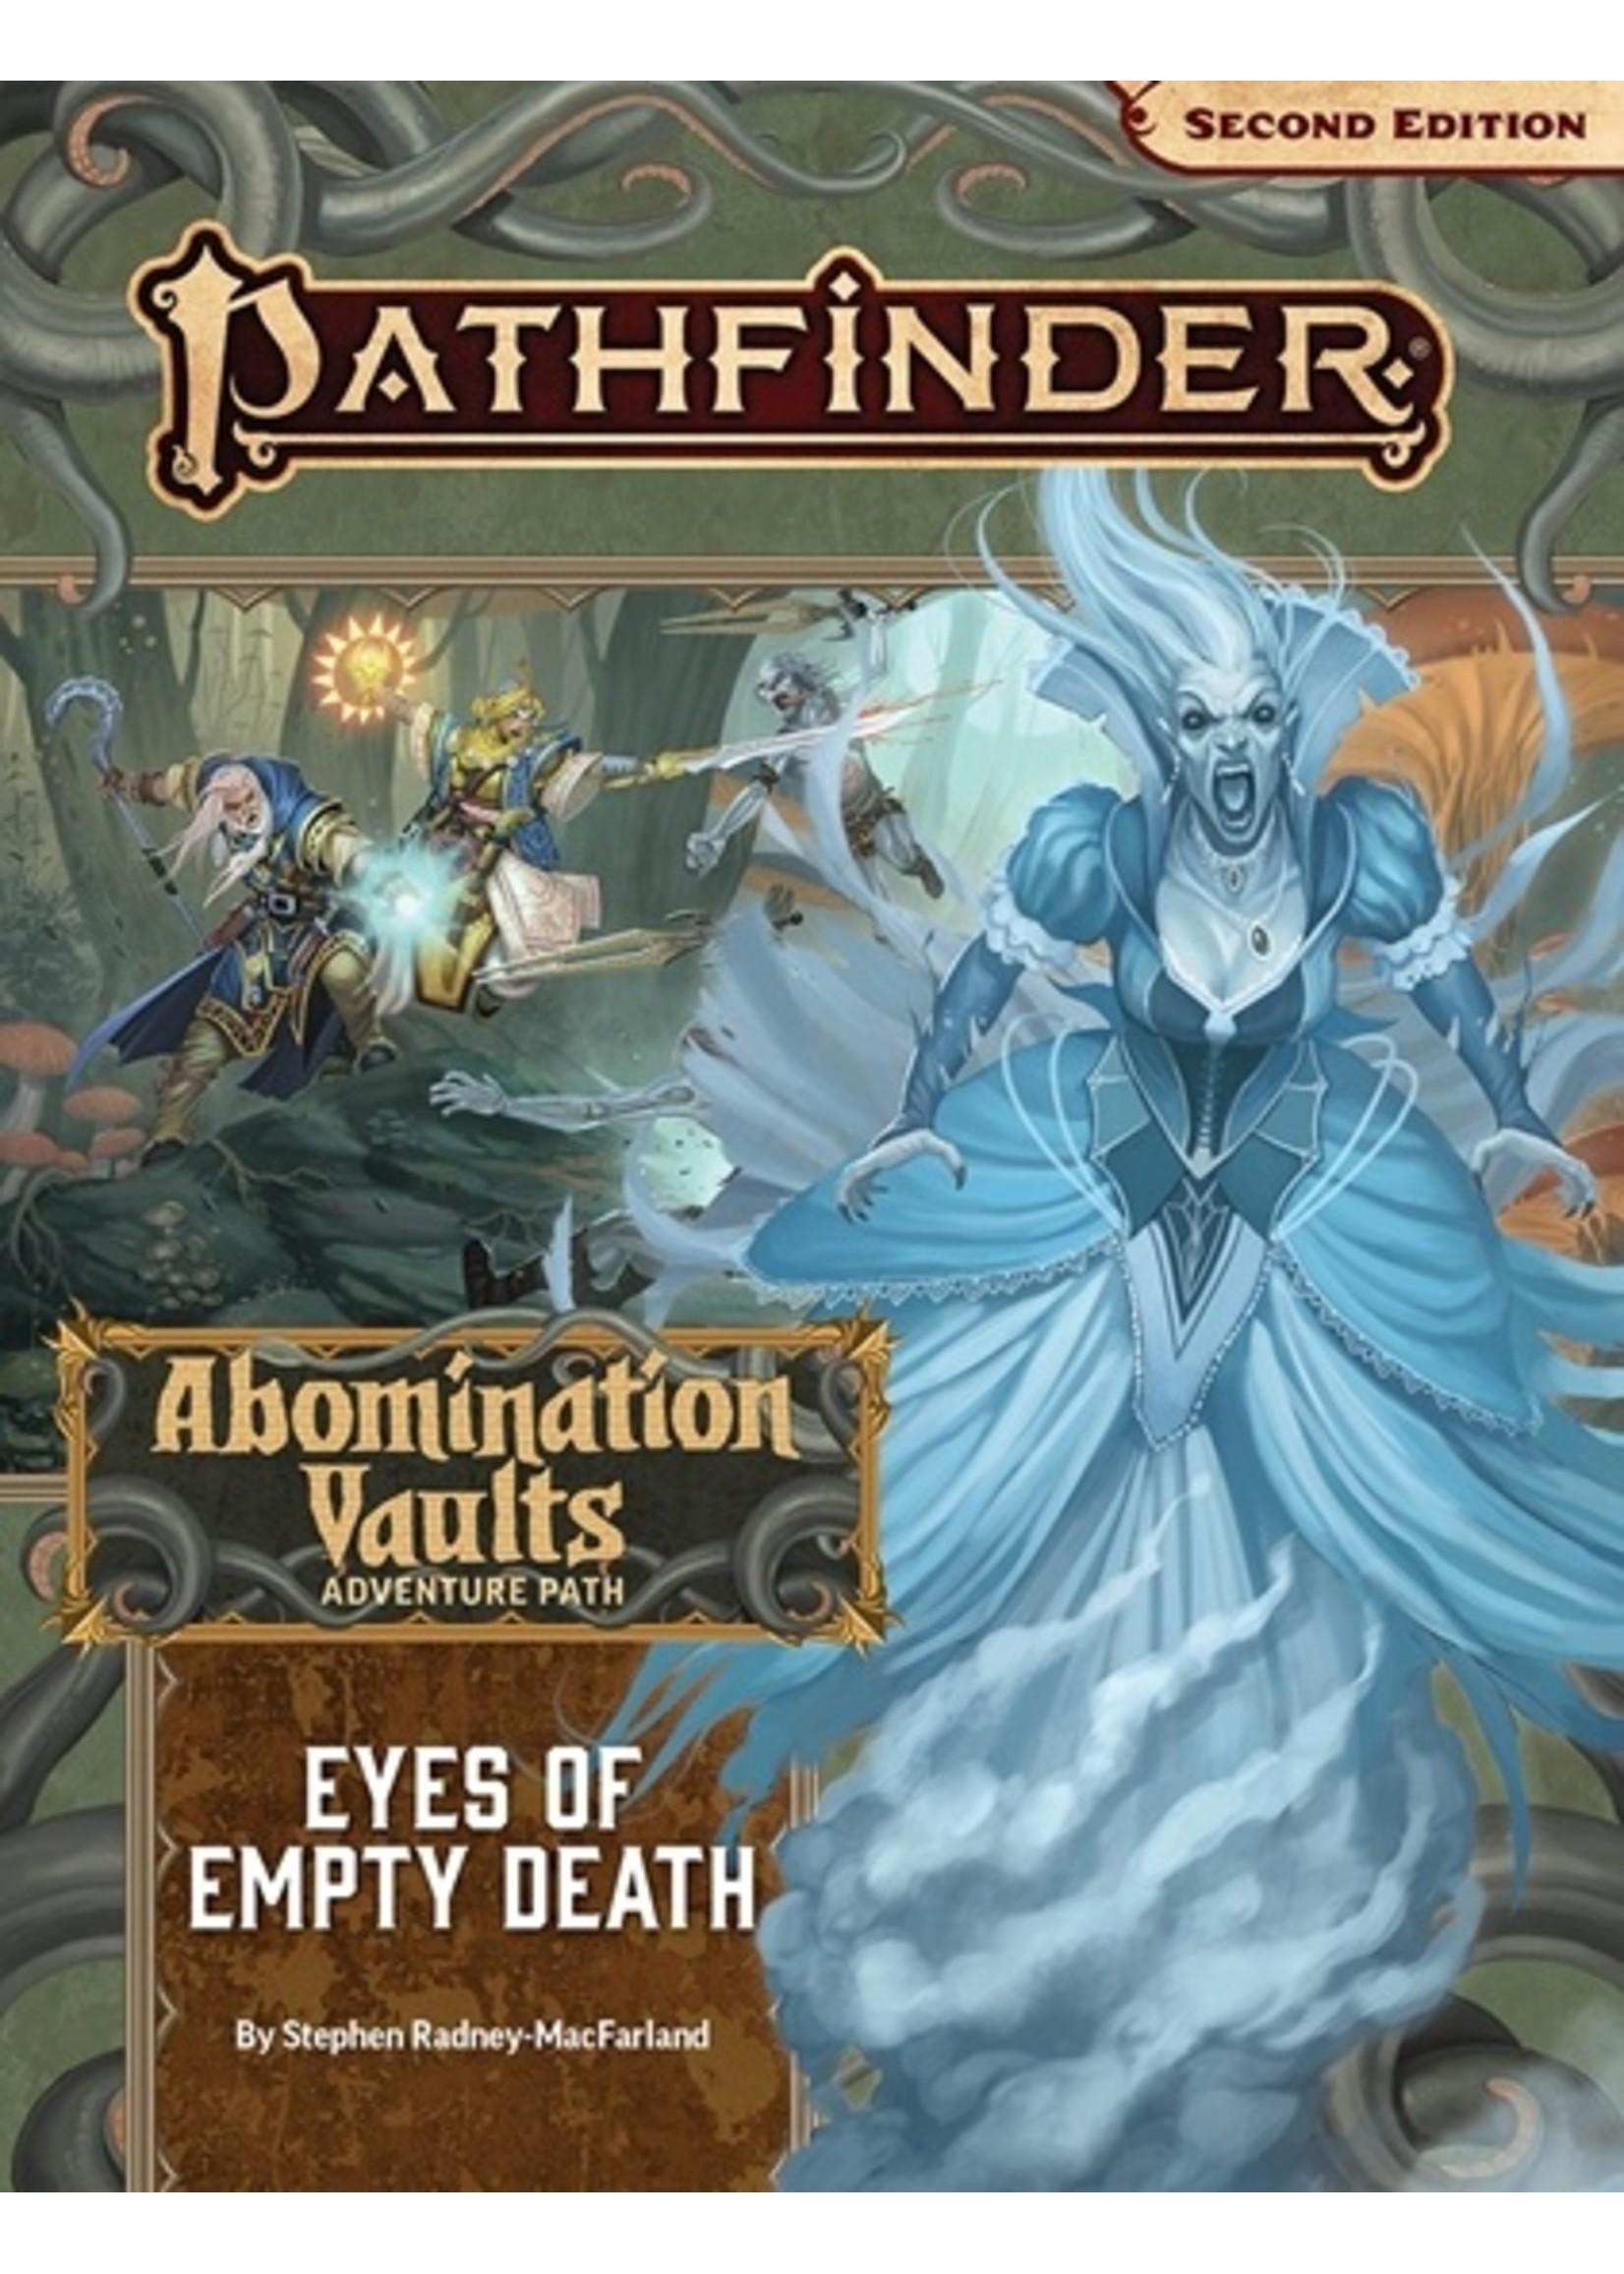 Pathfinder RPG: Adventure Path - Abomination Vaults Part 3 - Eyes of Empty Death (P2)